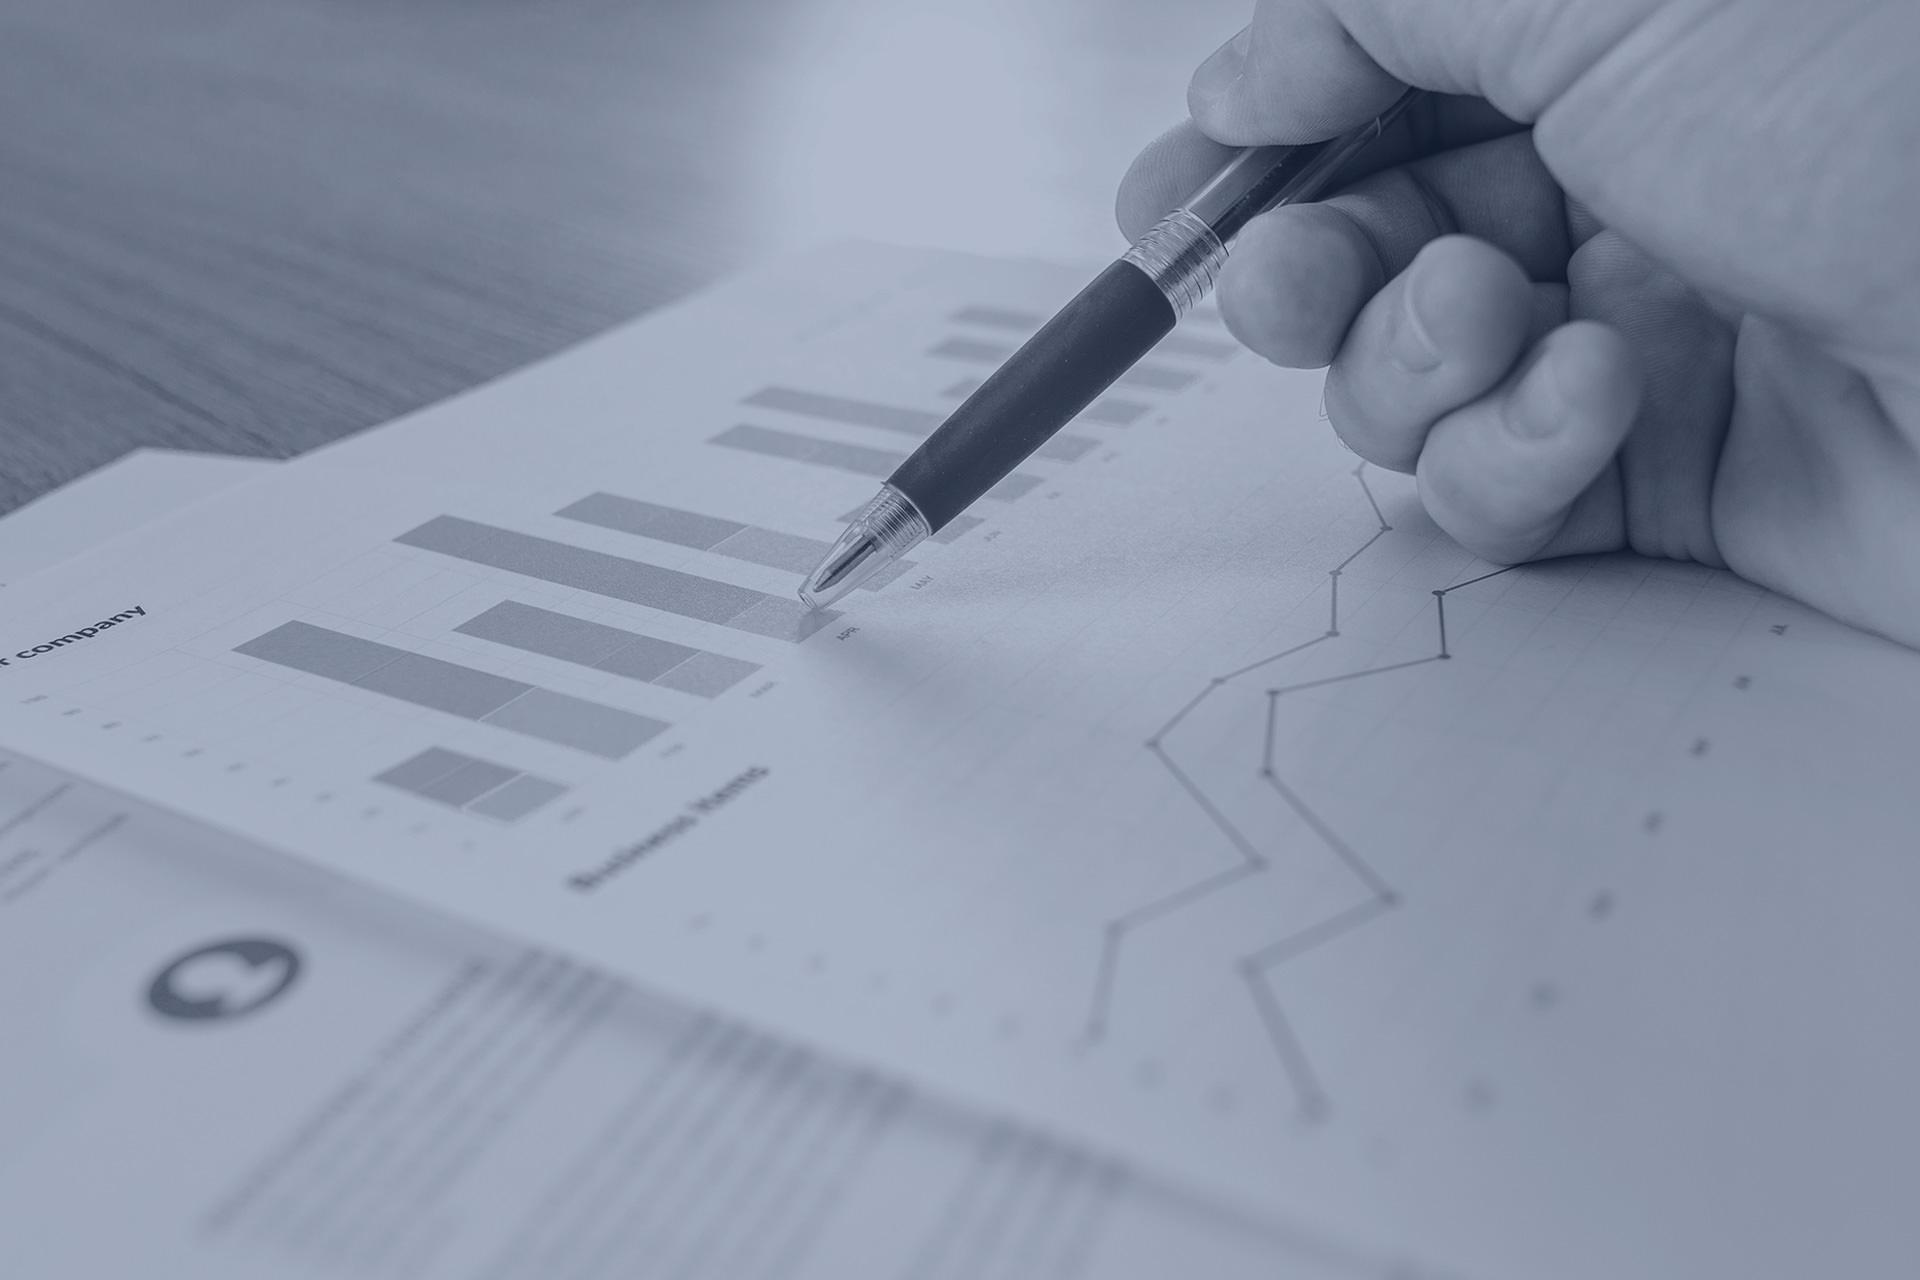 gráficos financiación de empresas